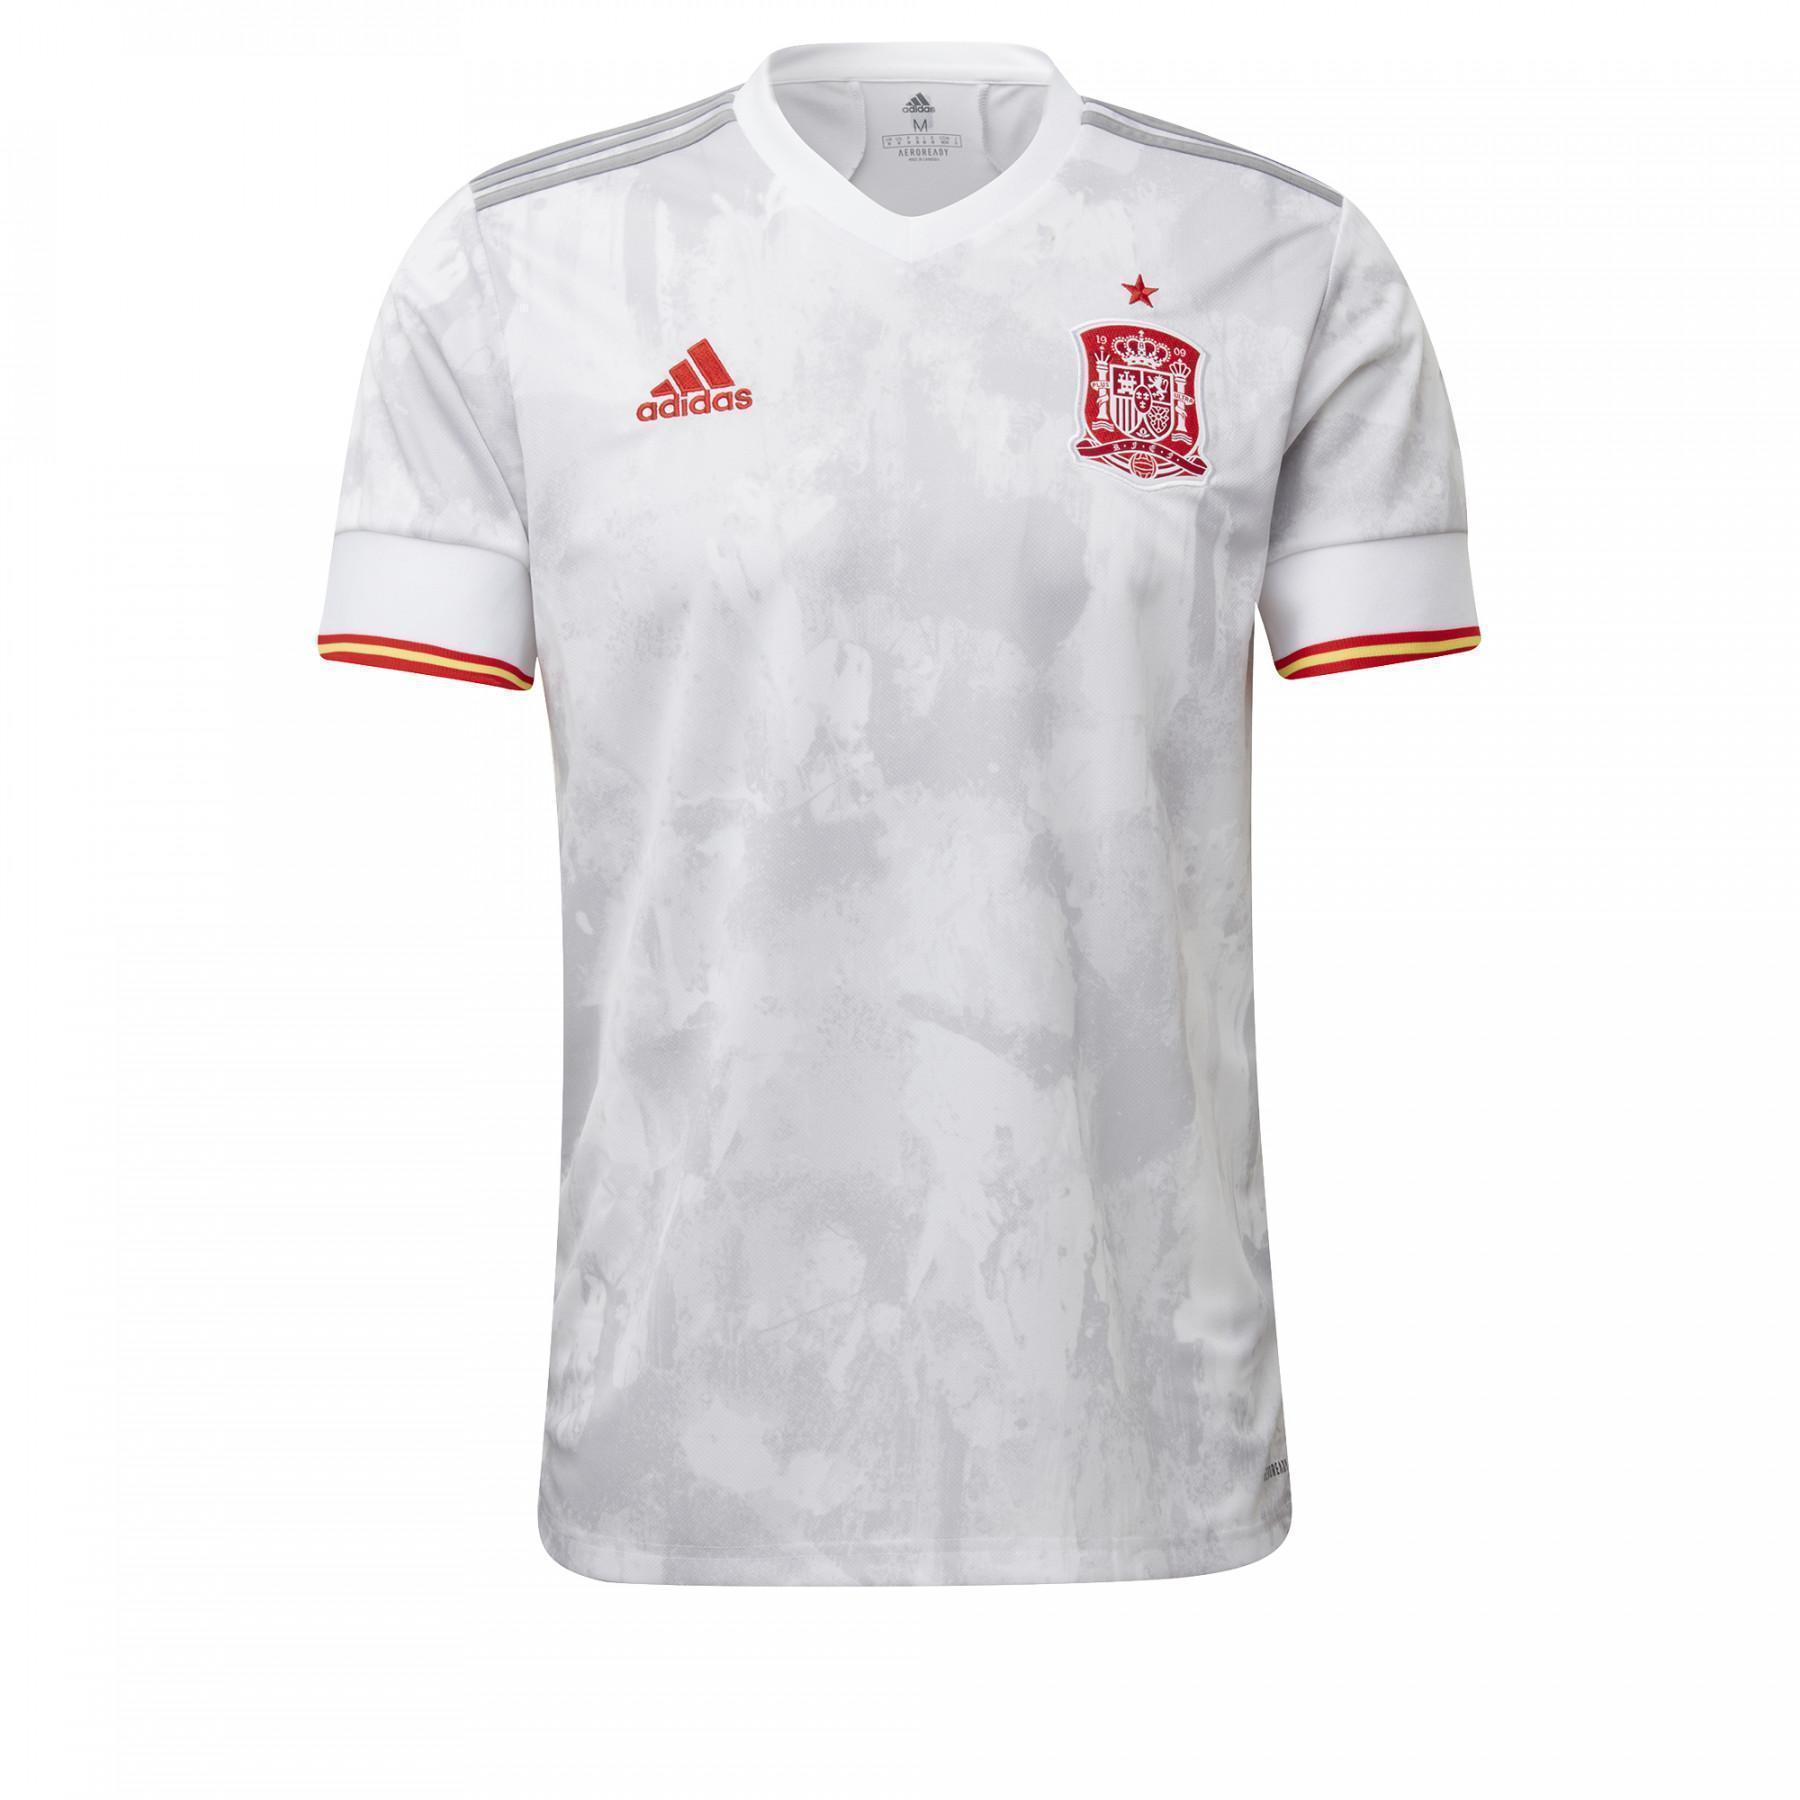 Camiseta de España para la Eurocopa 2020